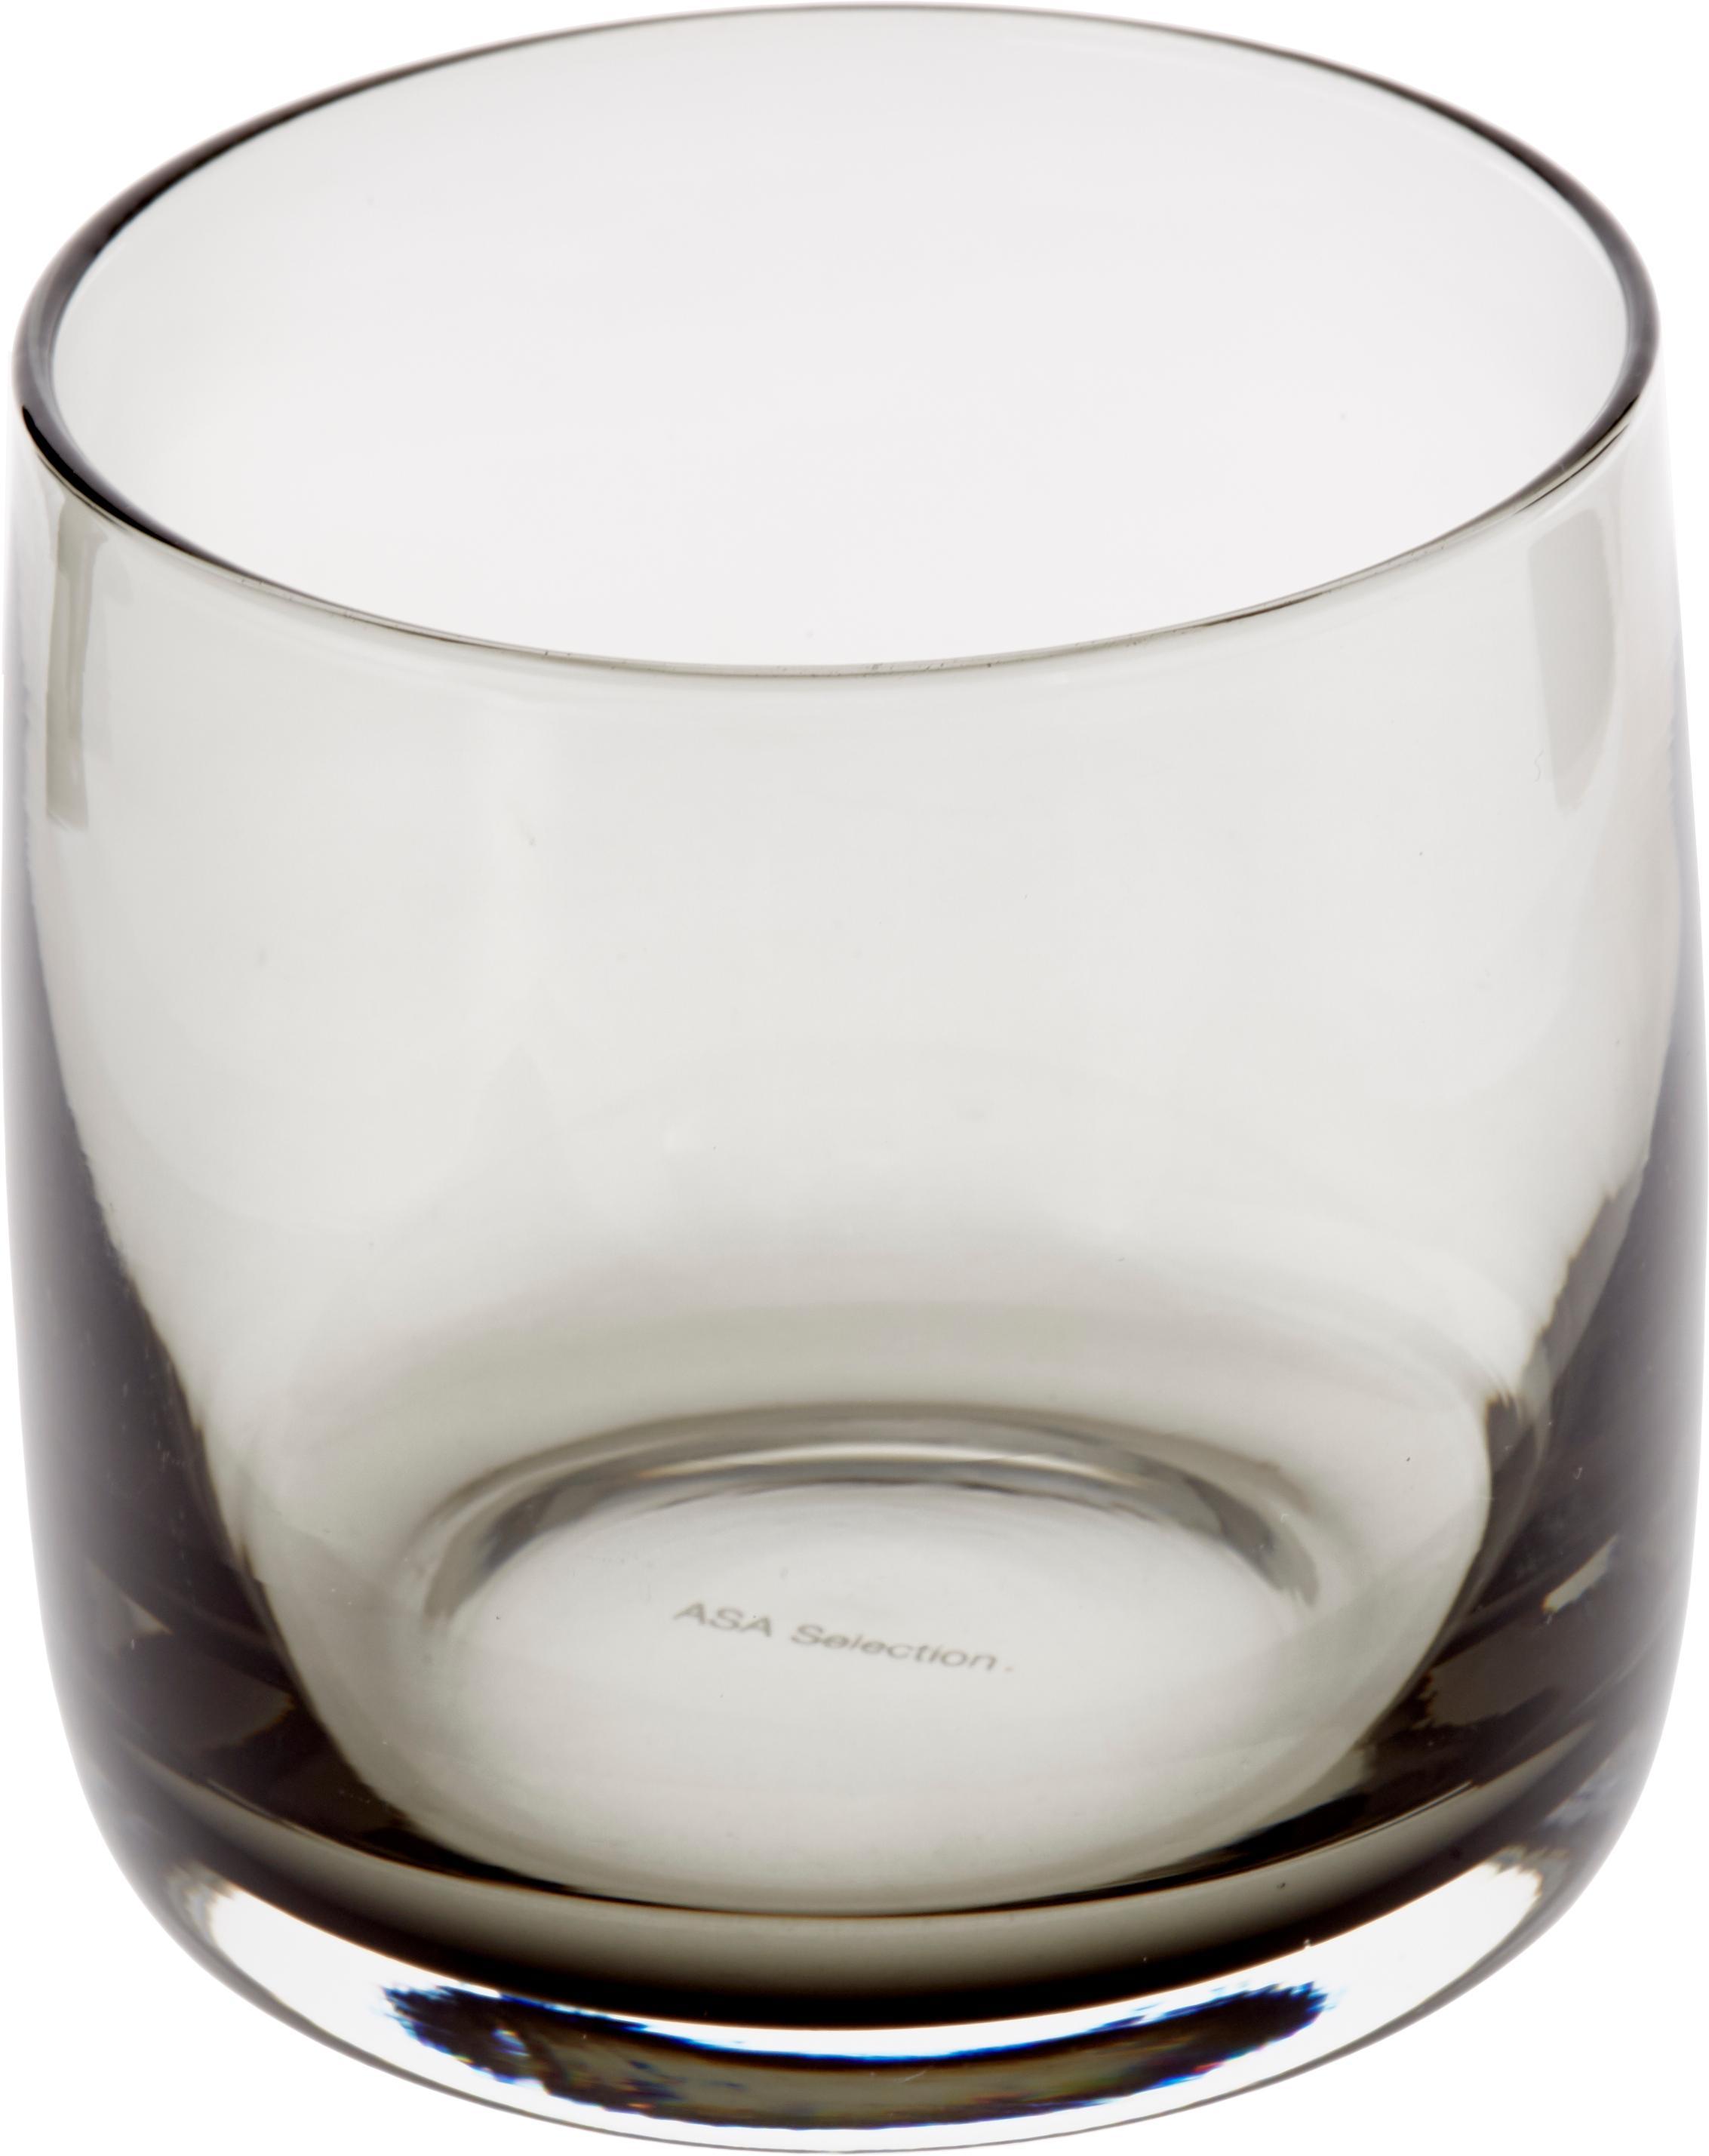 Waterglazen Colored in grijs/transparant, 6 stuks, Glas, Grijs, transparant, Ø 8 x H 8 cm